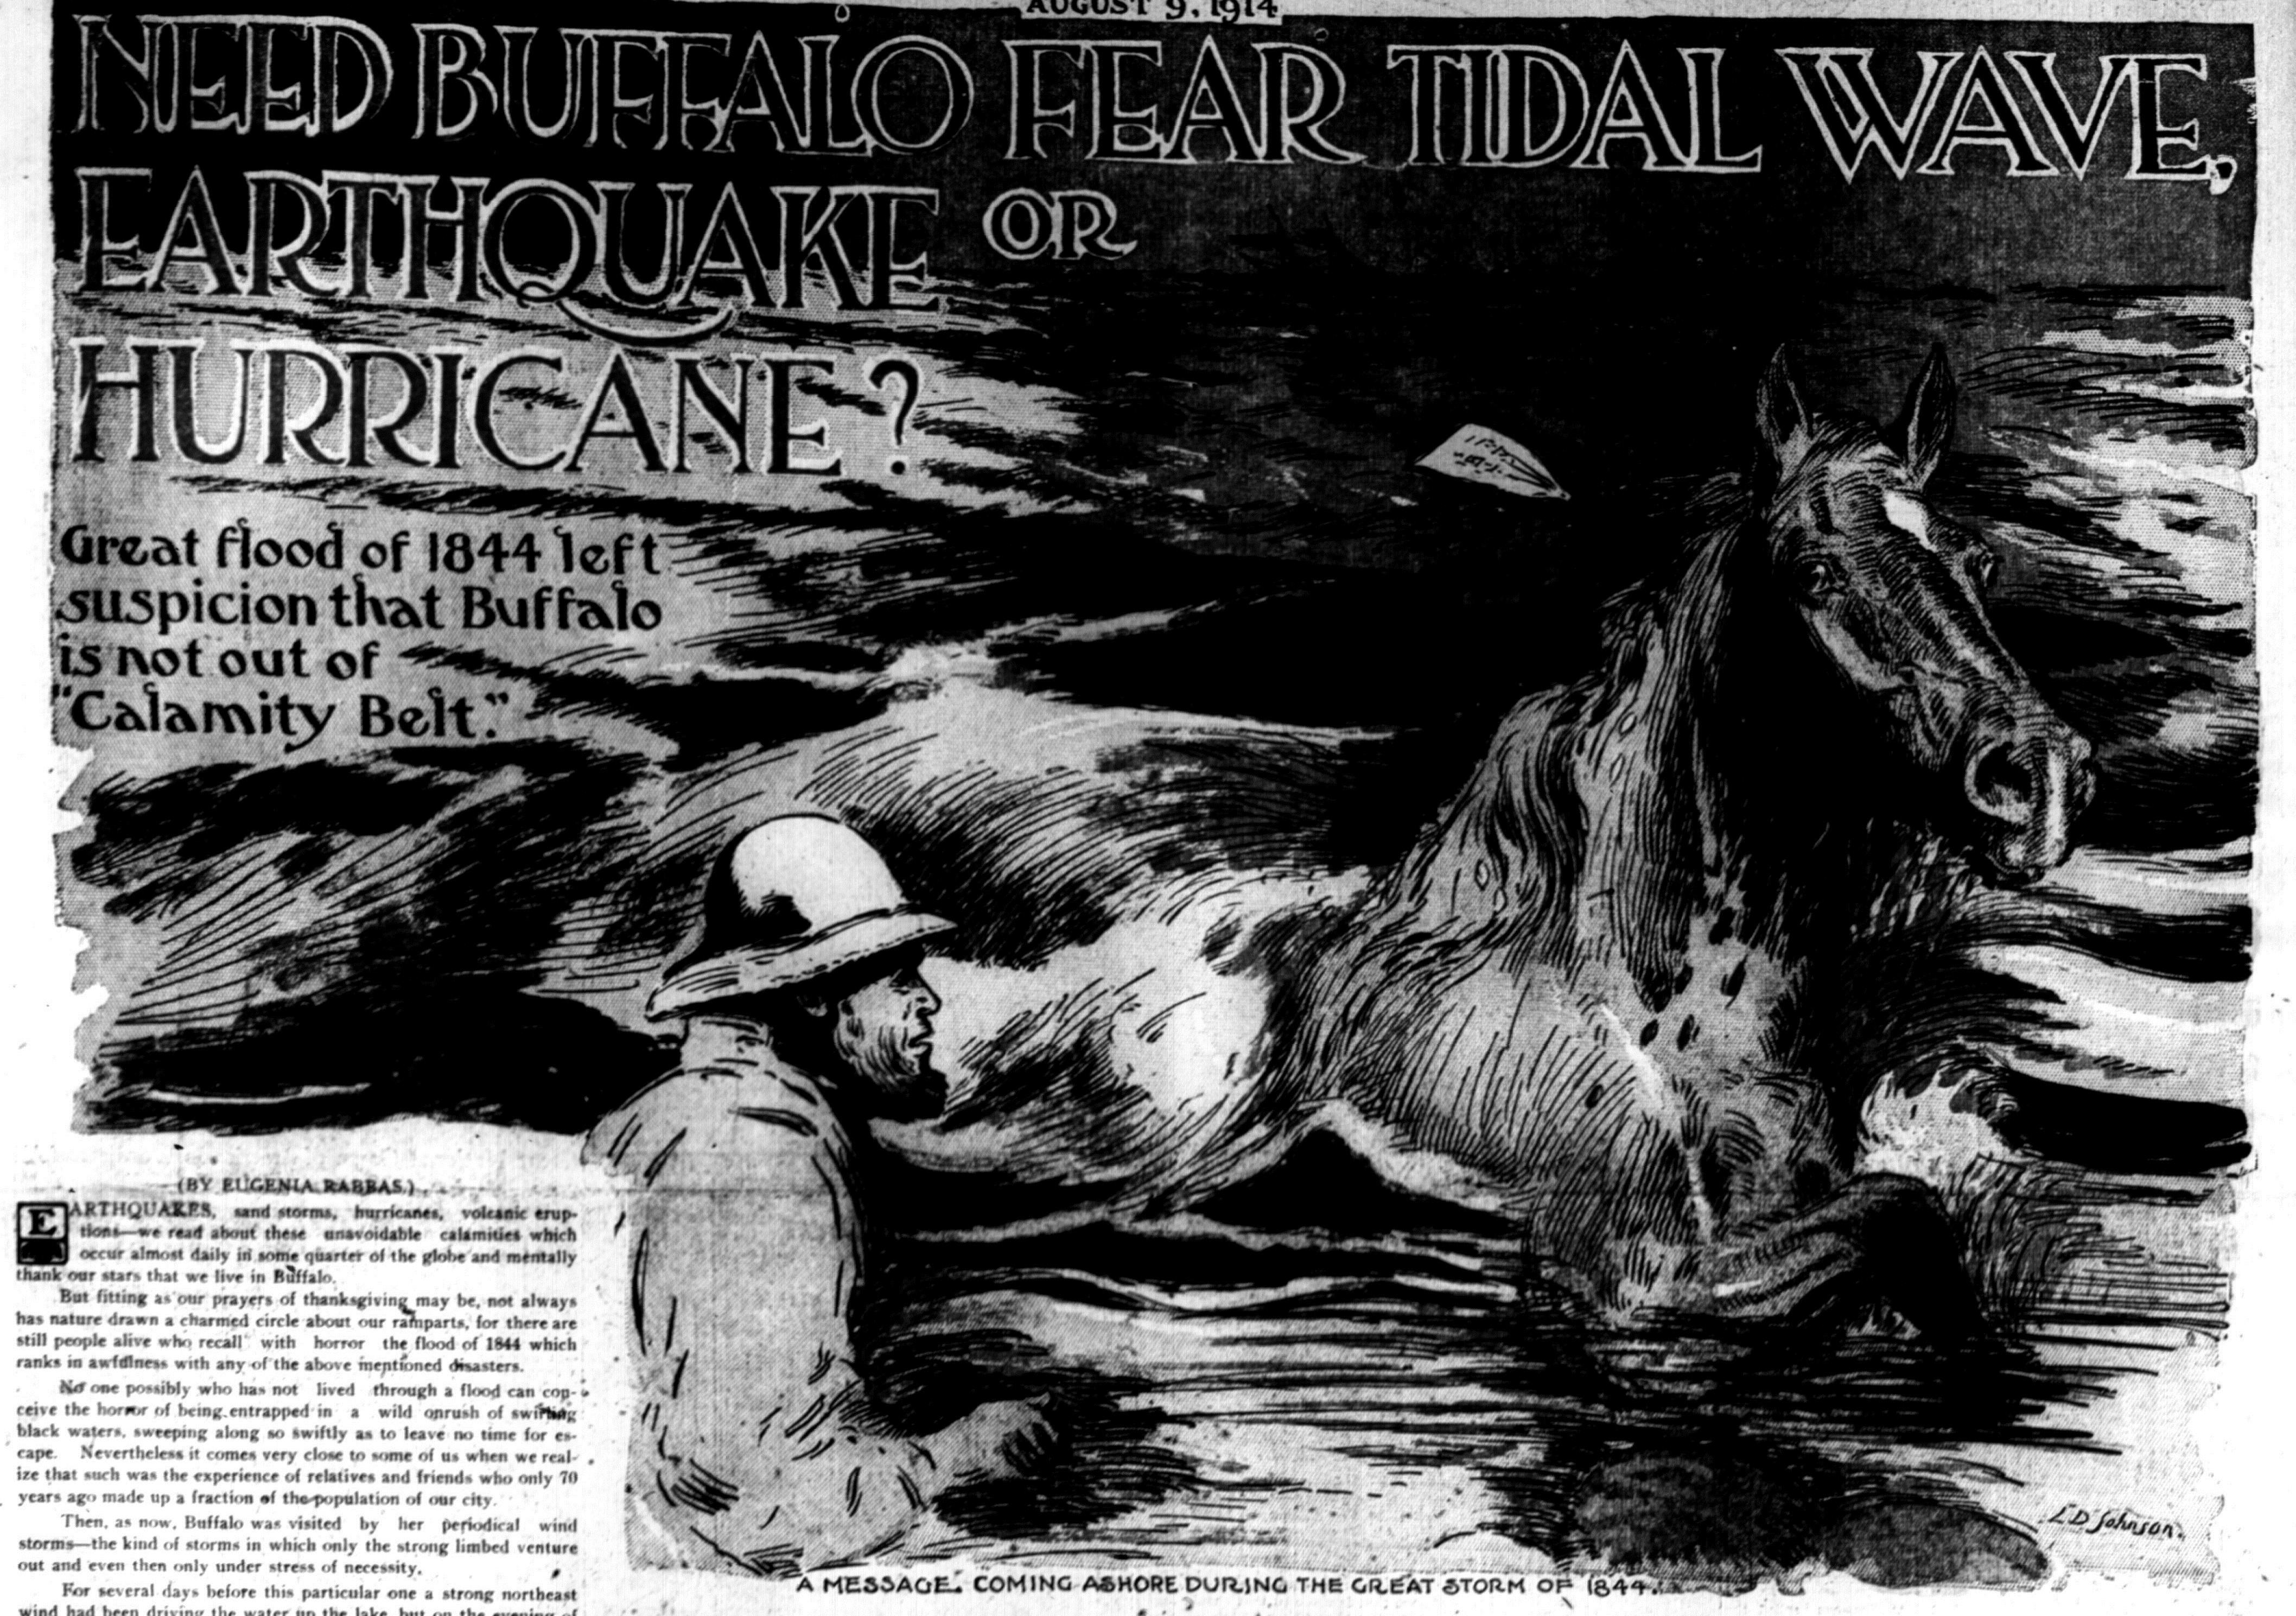 Oct. 18, 1844: 'Great flood of 1844' devastates Buffalo – The Buffalo News